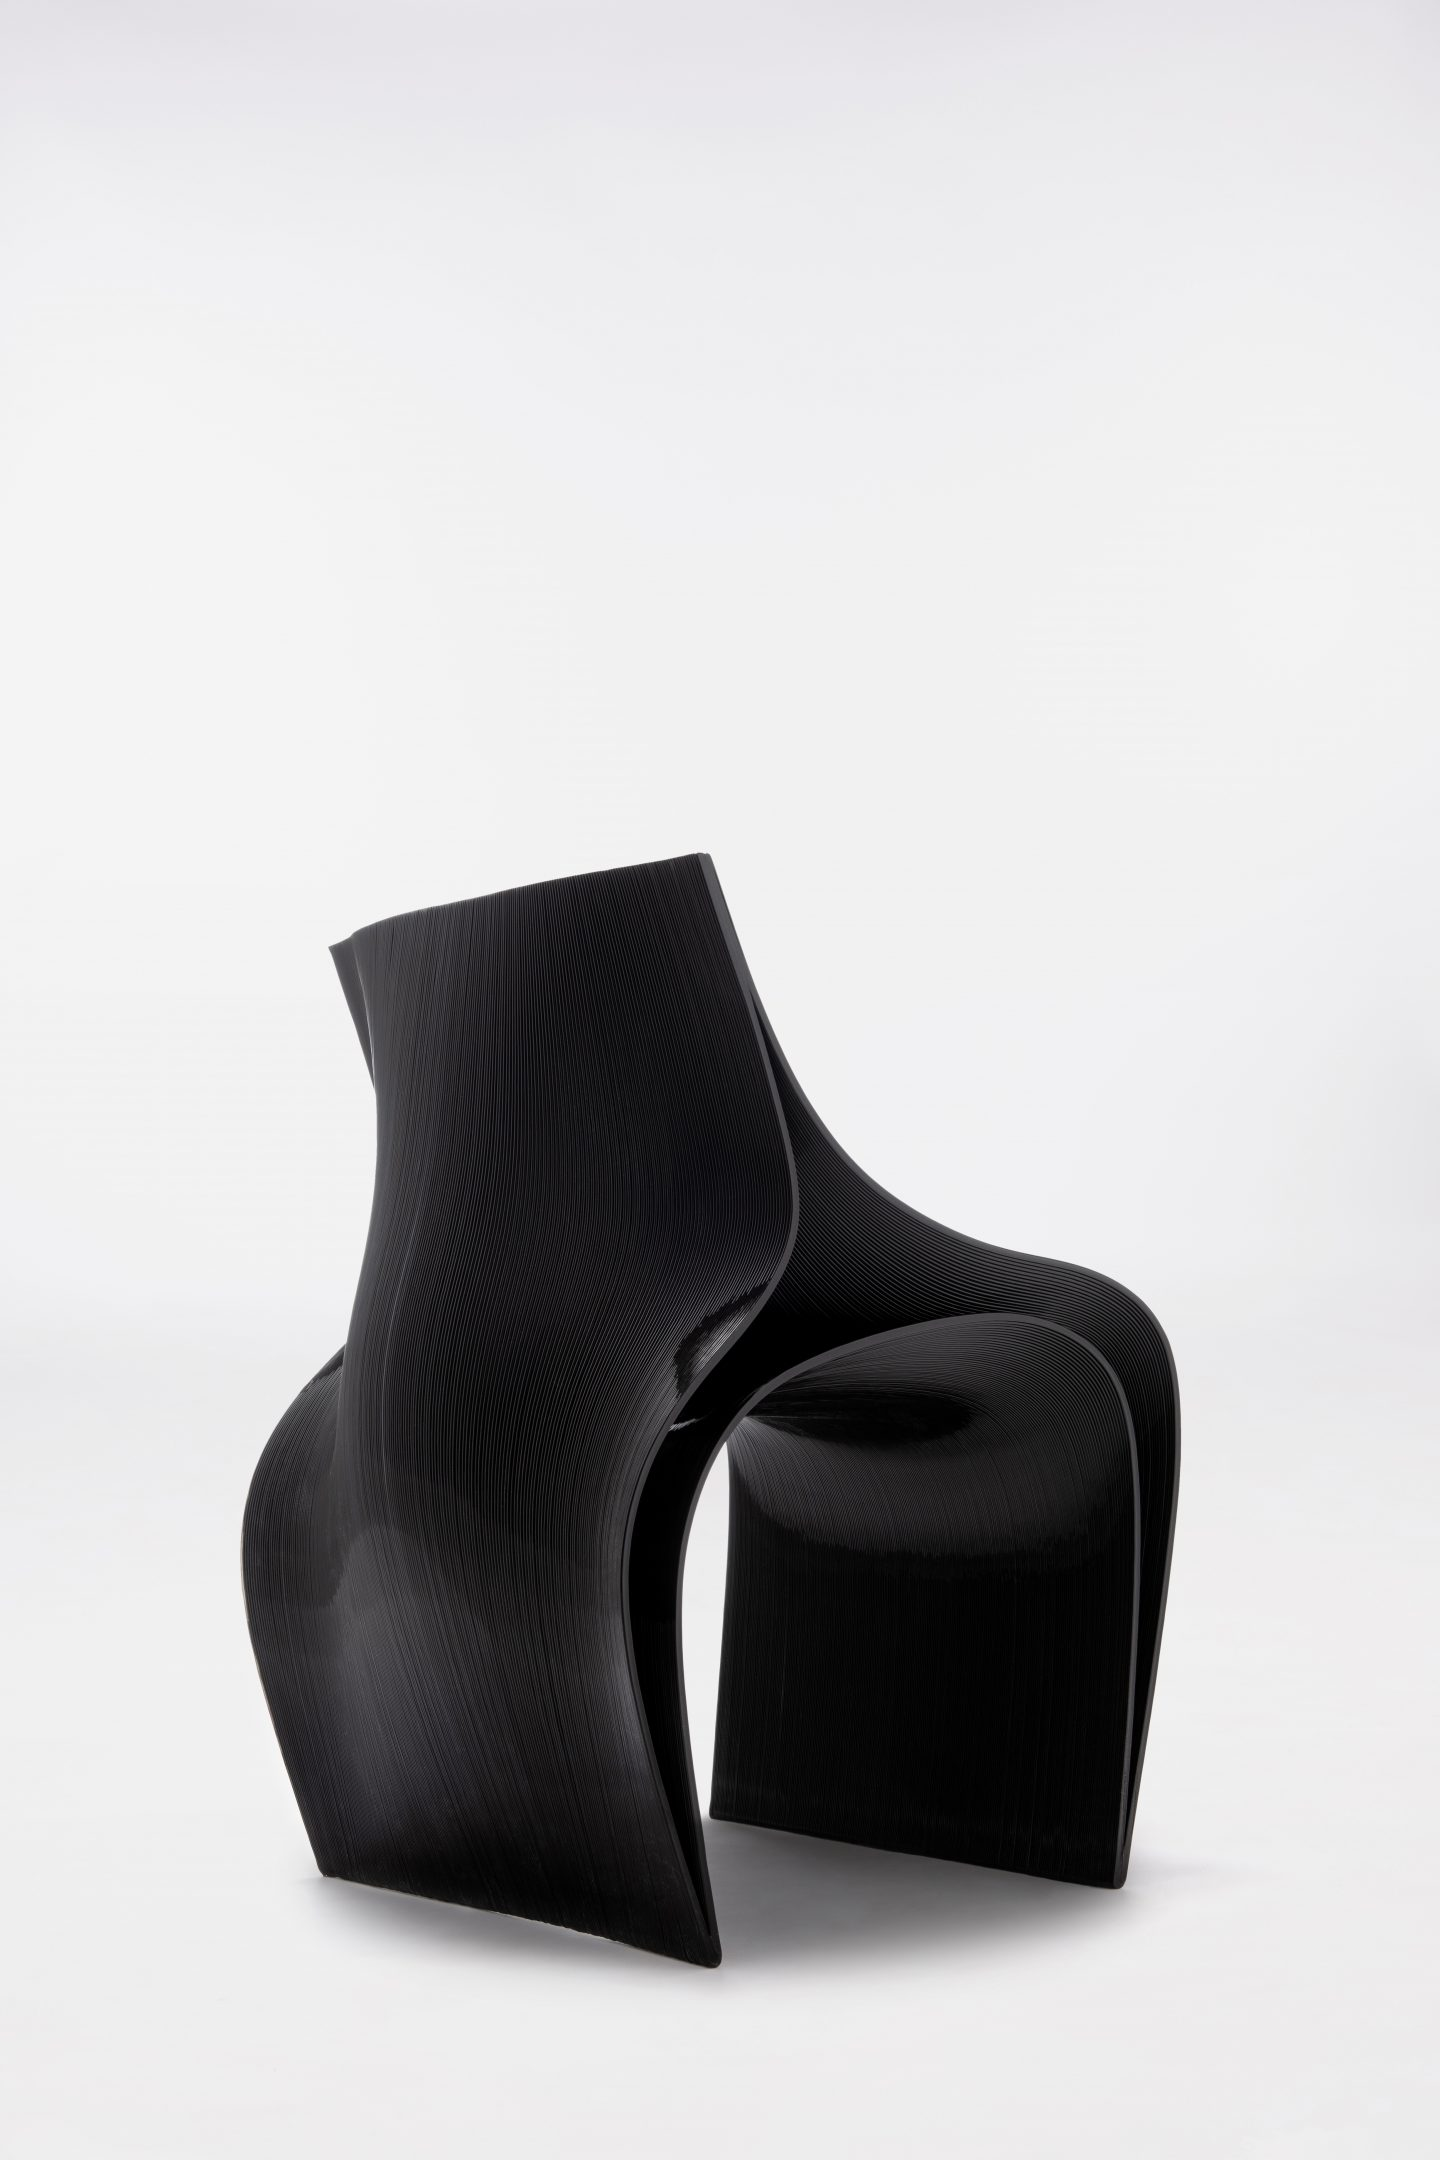 IGNANT-Art-Daniel-Widrig-4